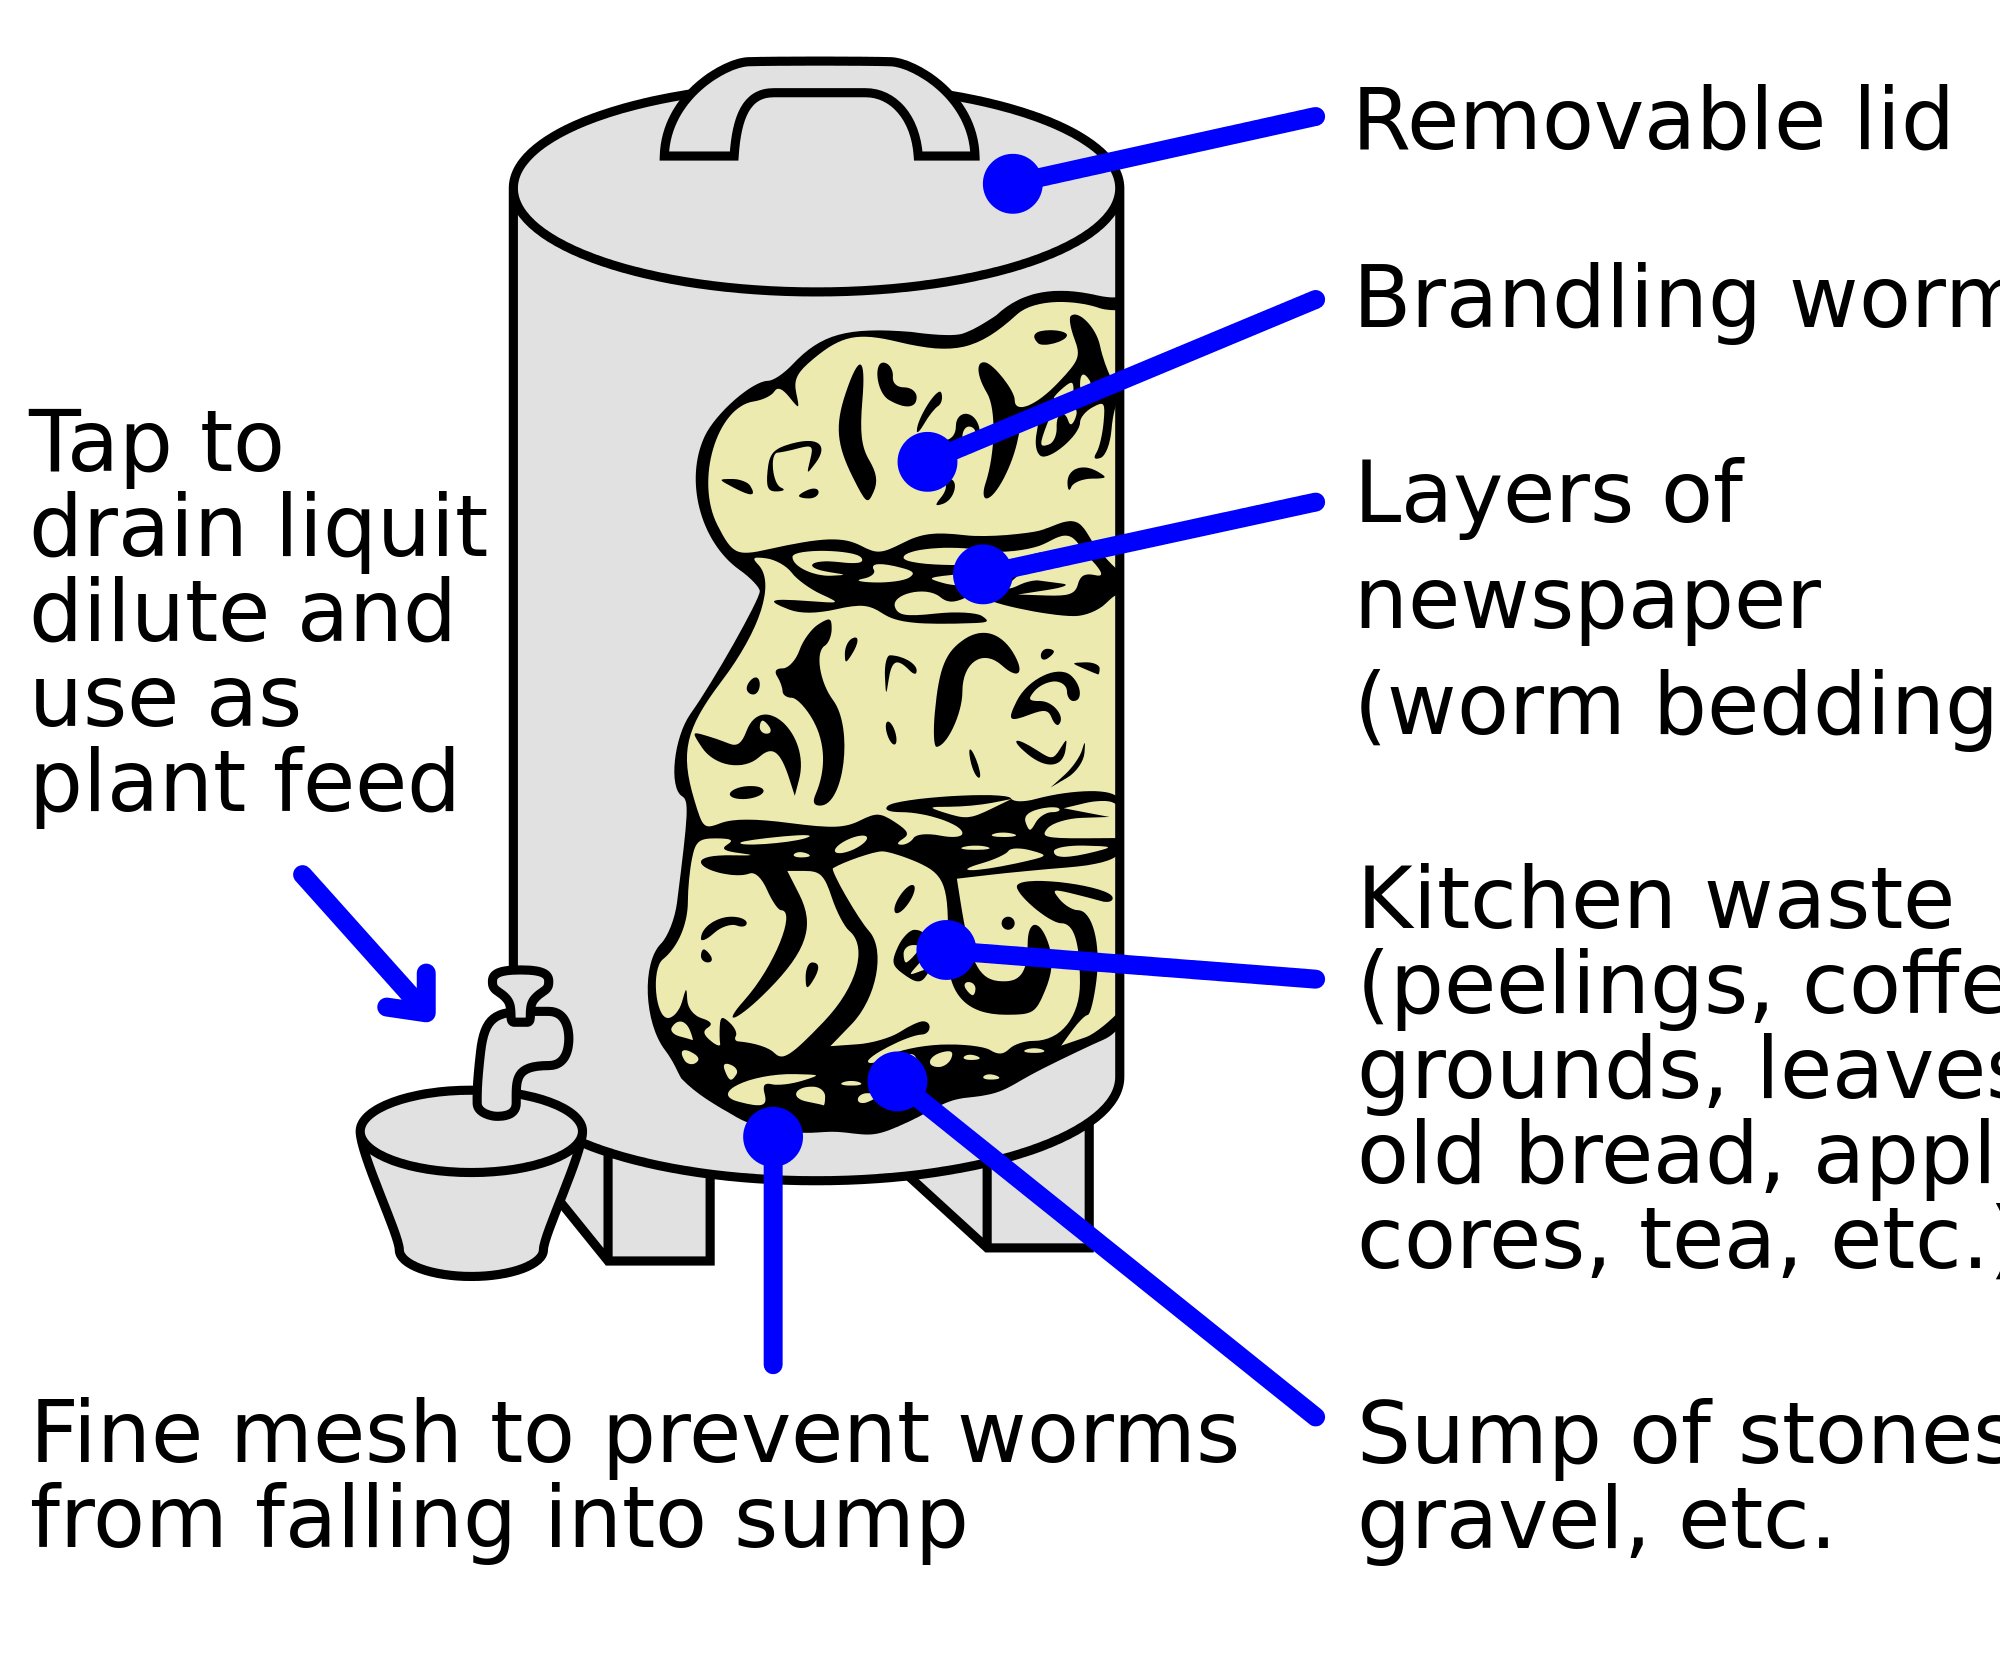 Worm clipart vermicomposting. Process diagram